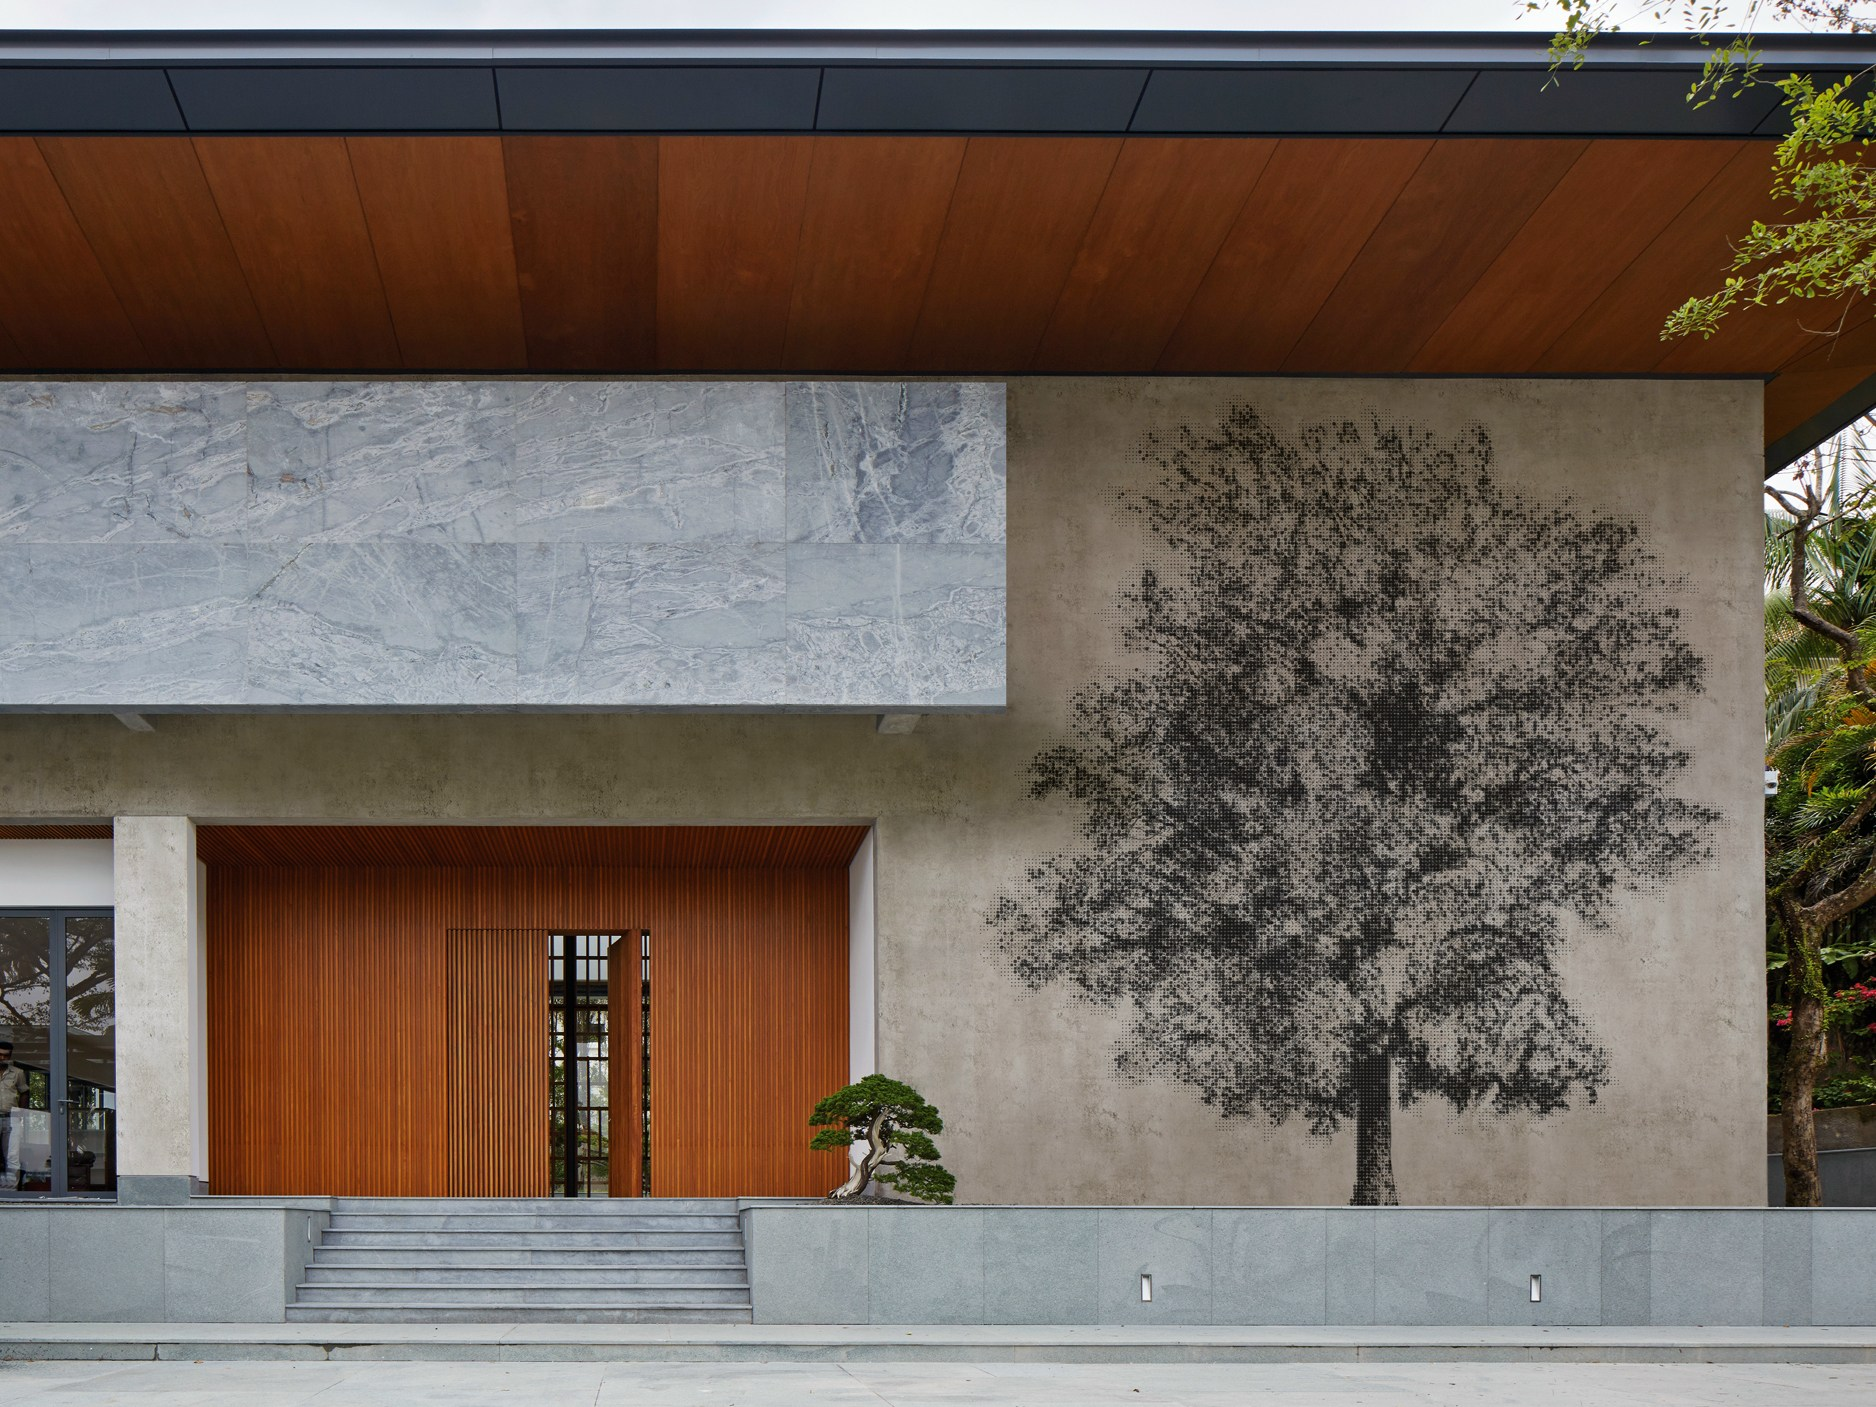 Wall And Deco Outdoor Wallpaper : Check outdoor wallpaper bon sai by wall dec? design bpm studio